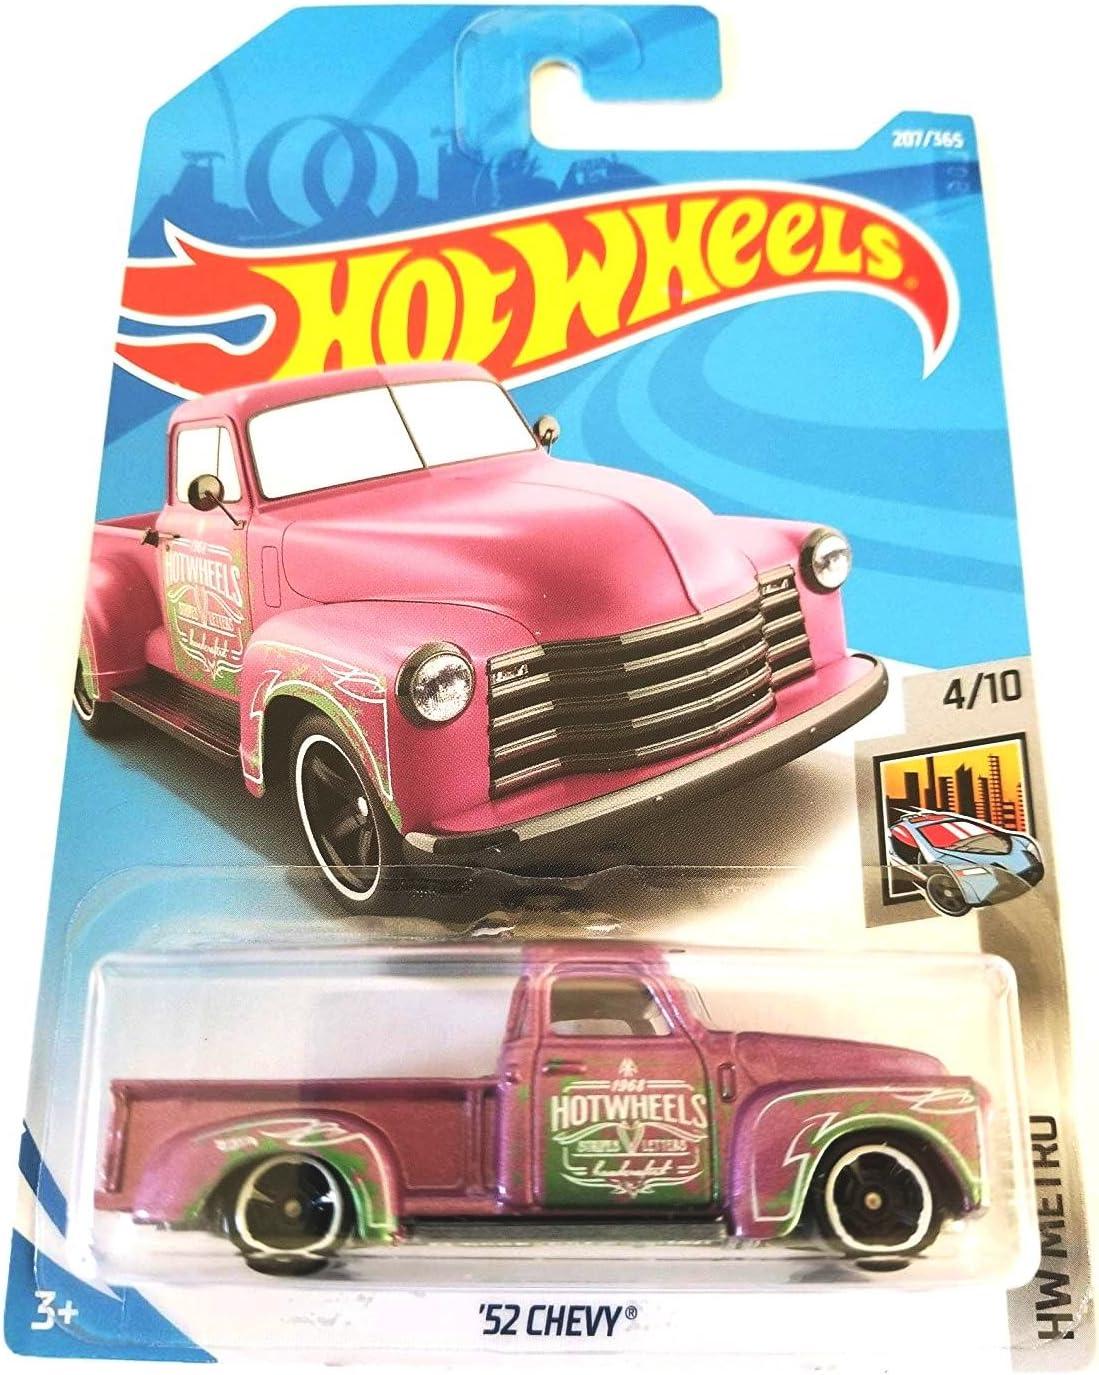 Hot Wheels 2018 50th Anniversary HW Metro '52 Chevy 207/365, Pink